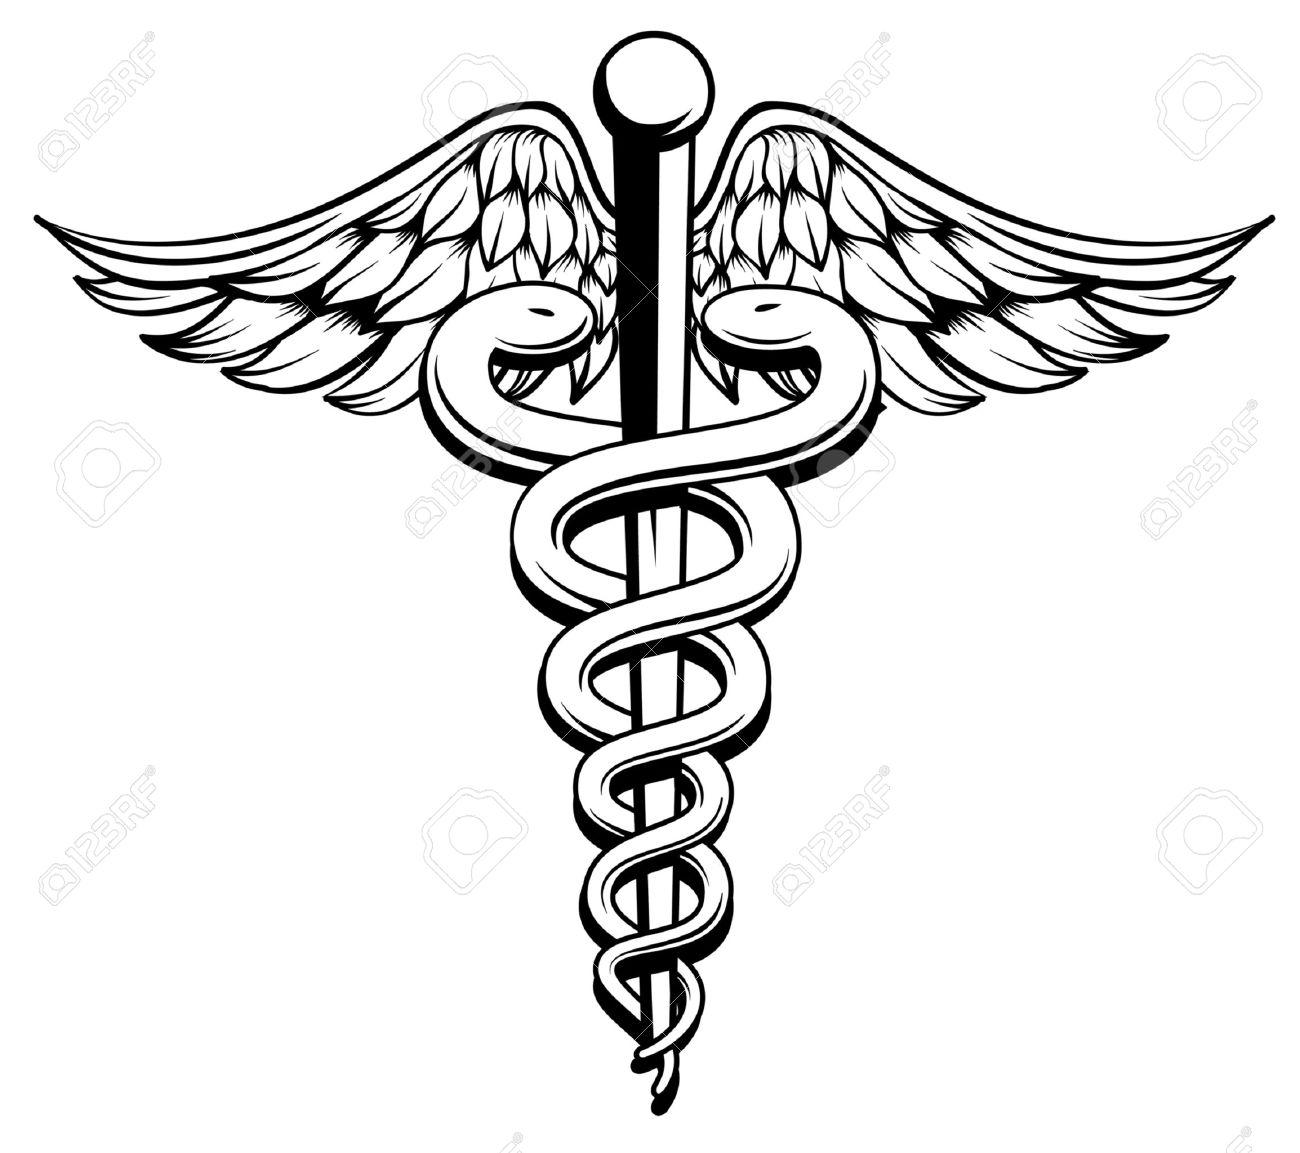 Medical Snake Clipart